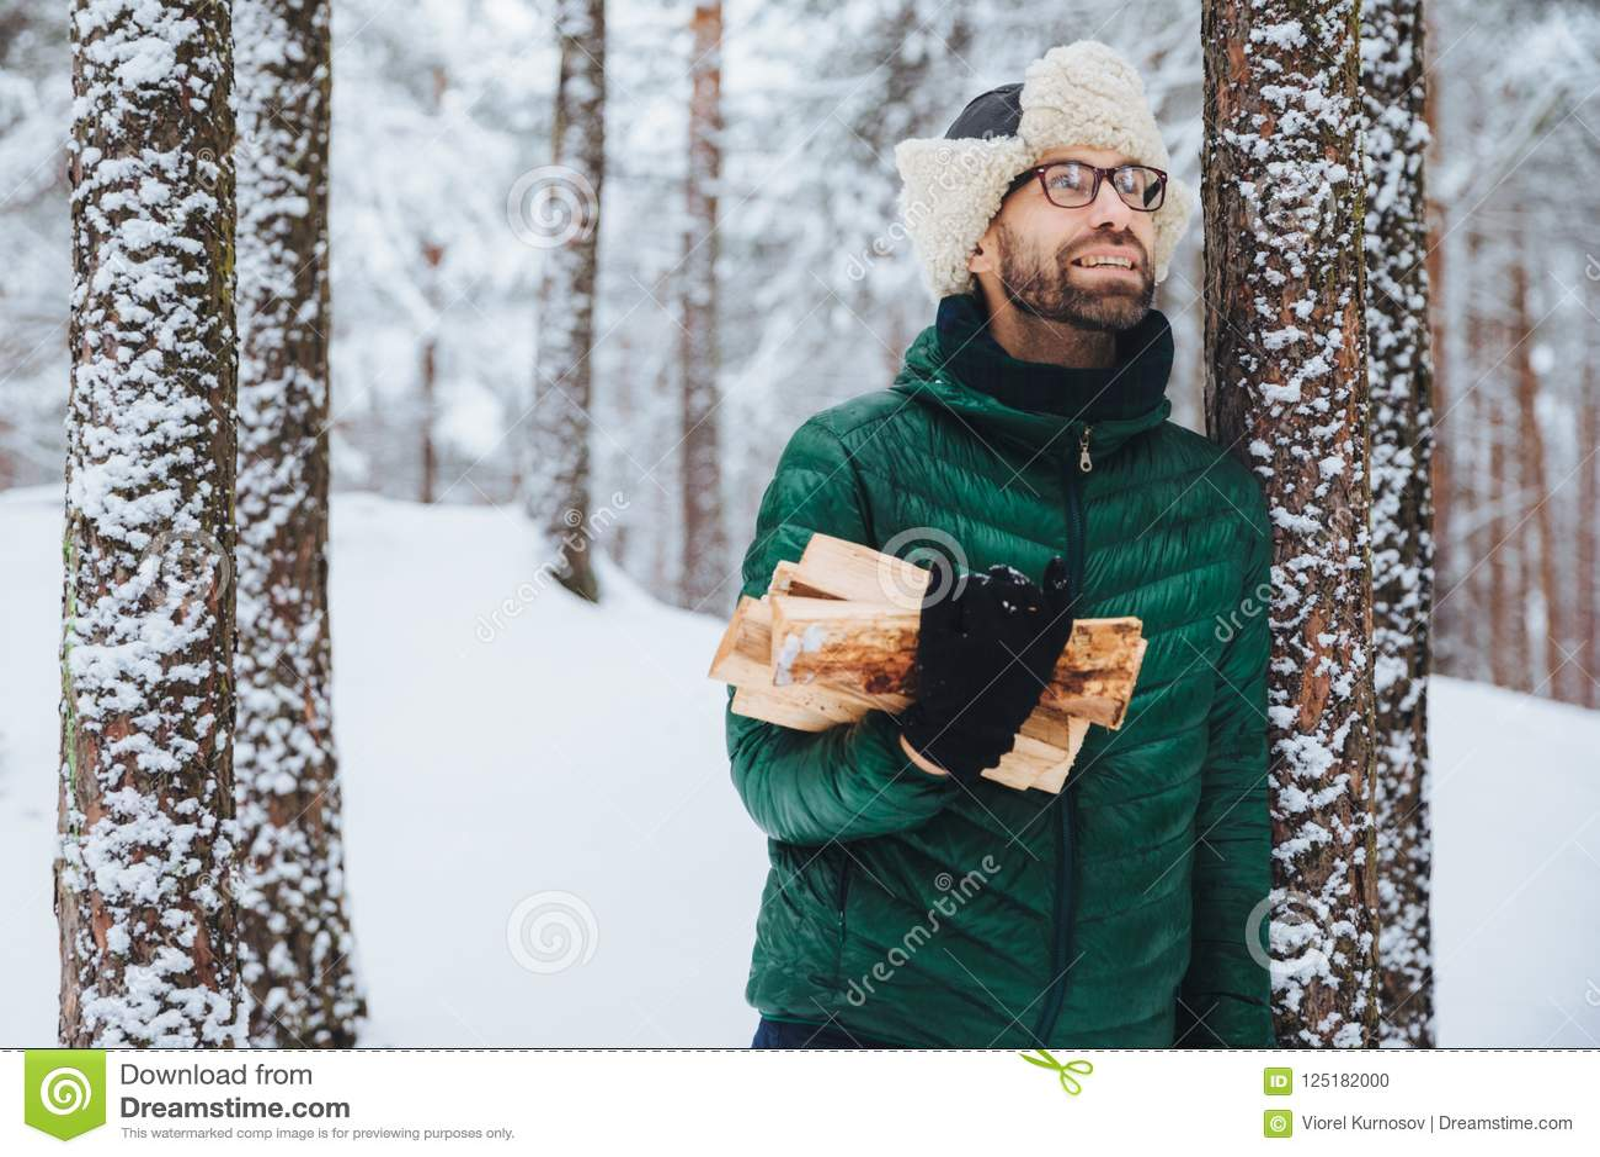 O retrato exterior de suportes masculinos de sorriso perto da árvore coberta com a neve, guarda a lenha, olha felizmente ascenden